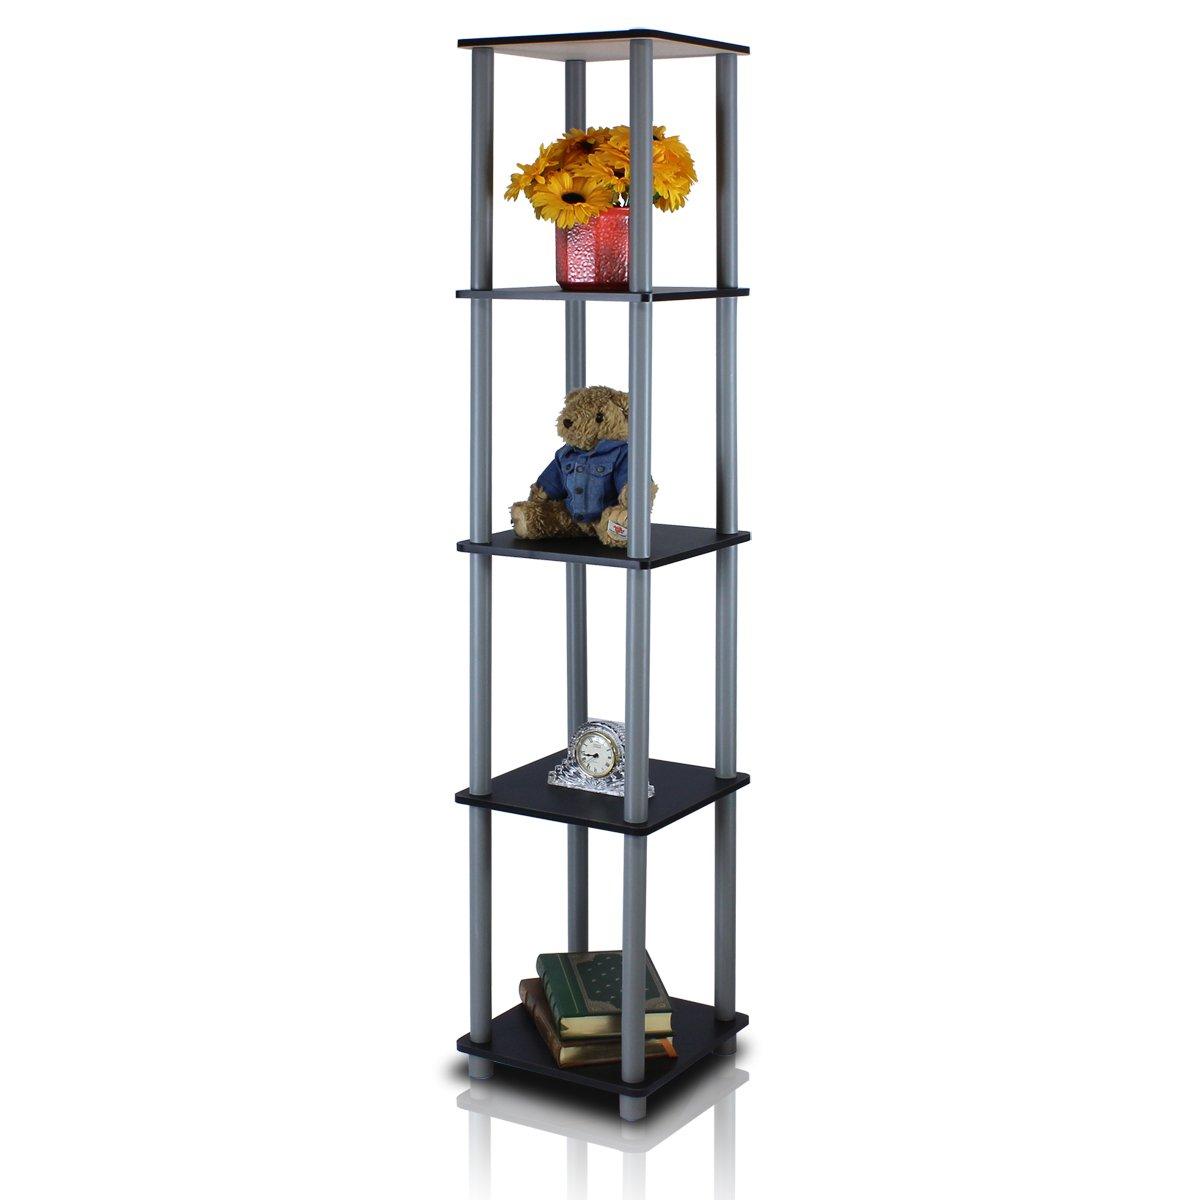 Furinno 99132BK/GY Turn-N-Tube 5-Tier Corner Square Rack Display Shelf, Black/Grey